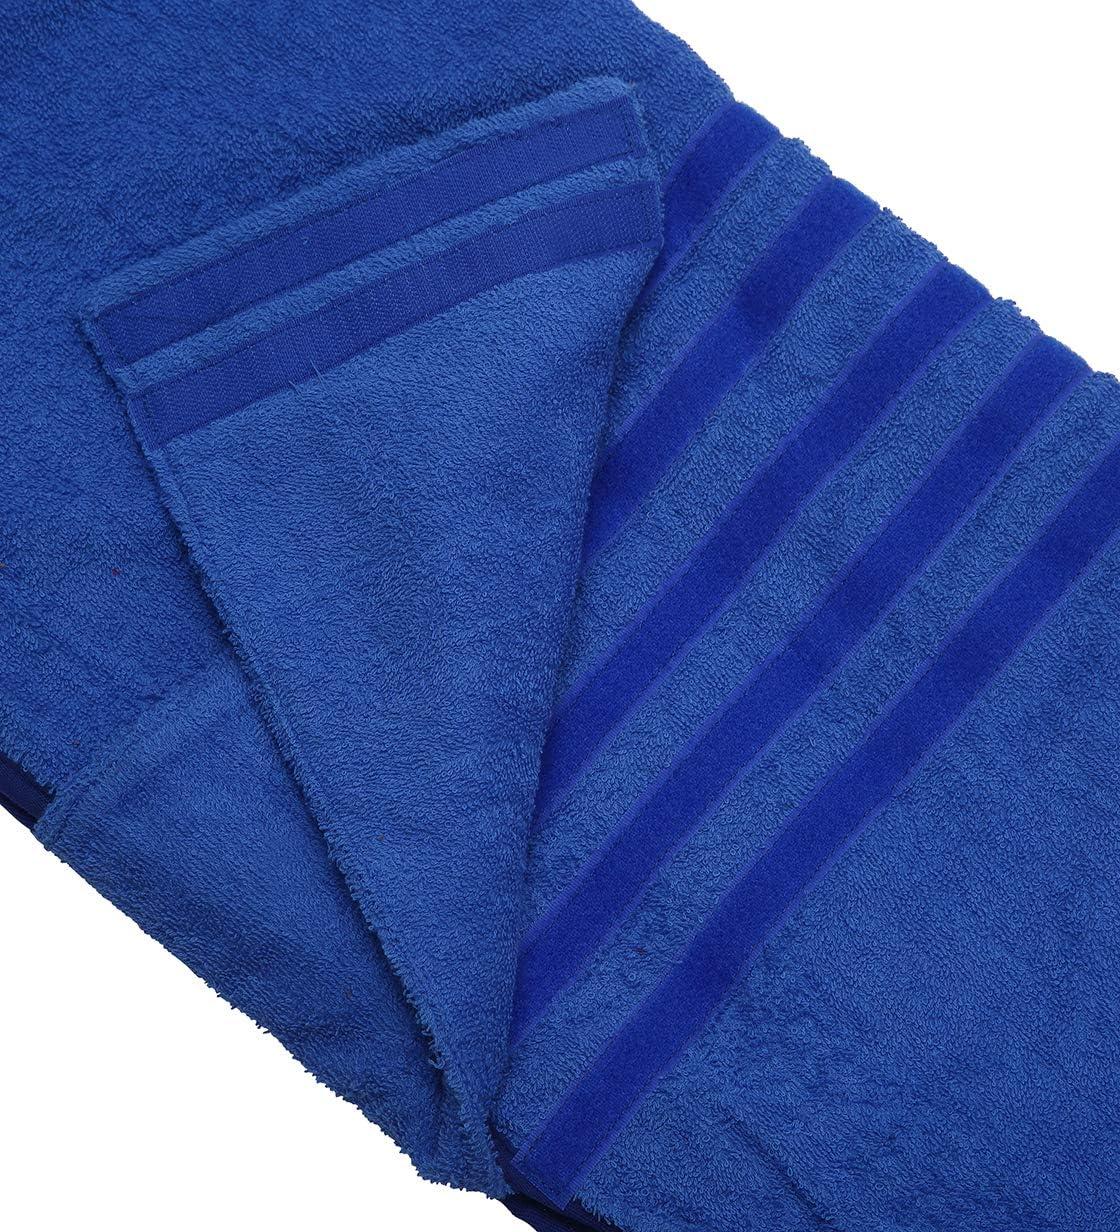 Morezi Pet towel microfibre dog bath robe anxiety relief jacket vest design keep calm wrap vest fit for xs small medium large dogs Blue Xlarge